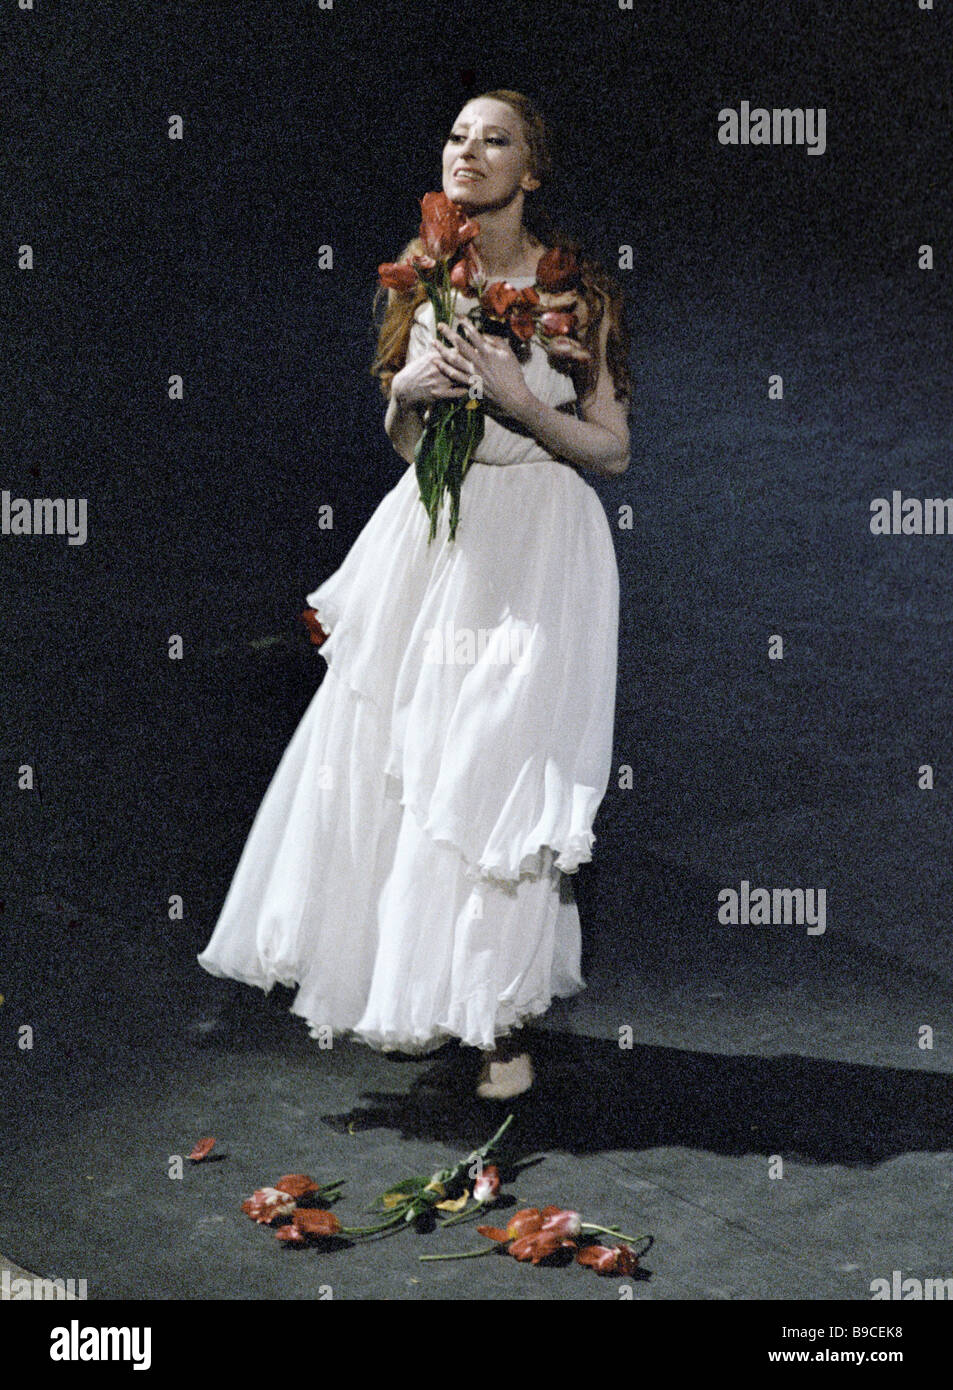 Celebrated Maya Plisetskaya greeting the audience - Stock Image